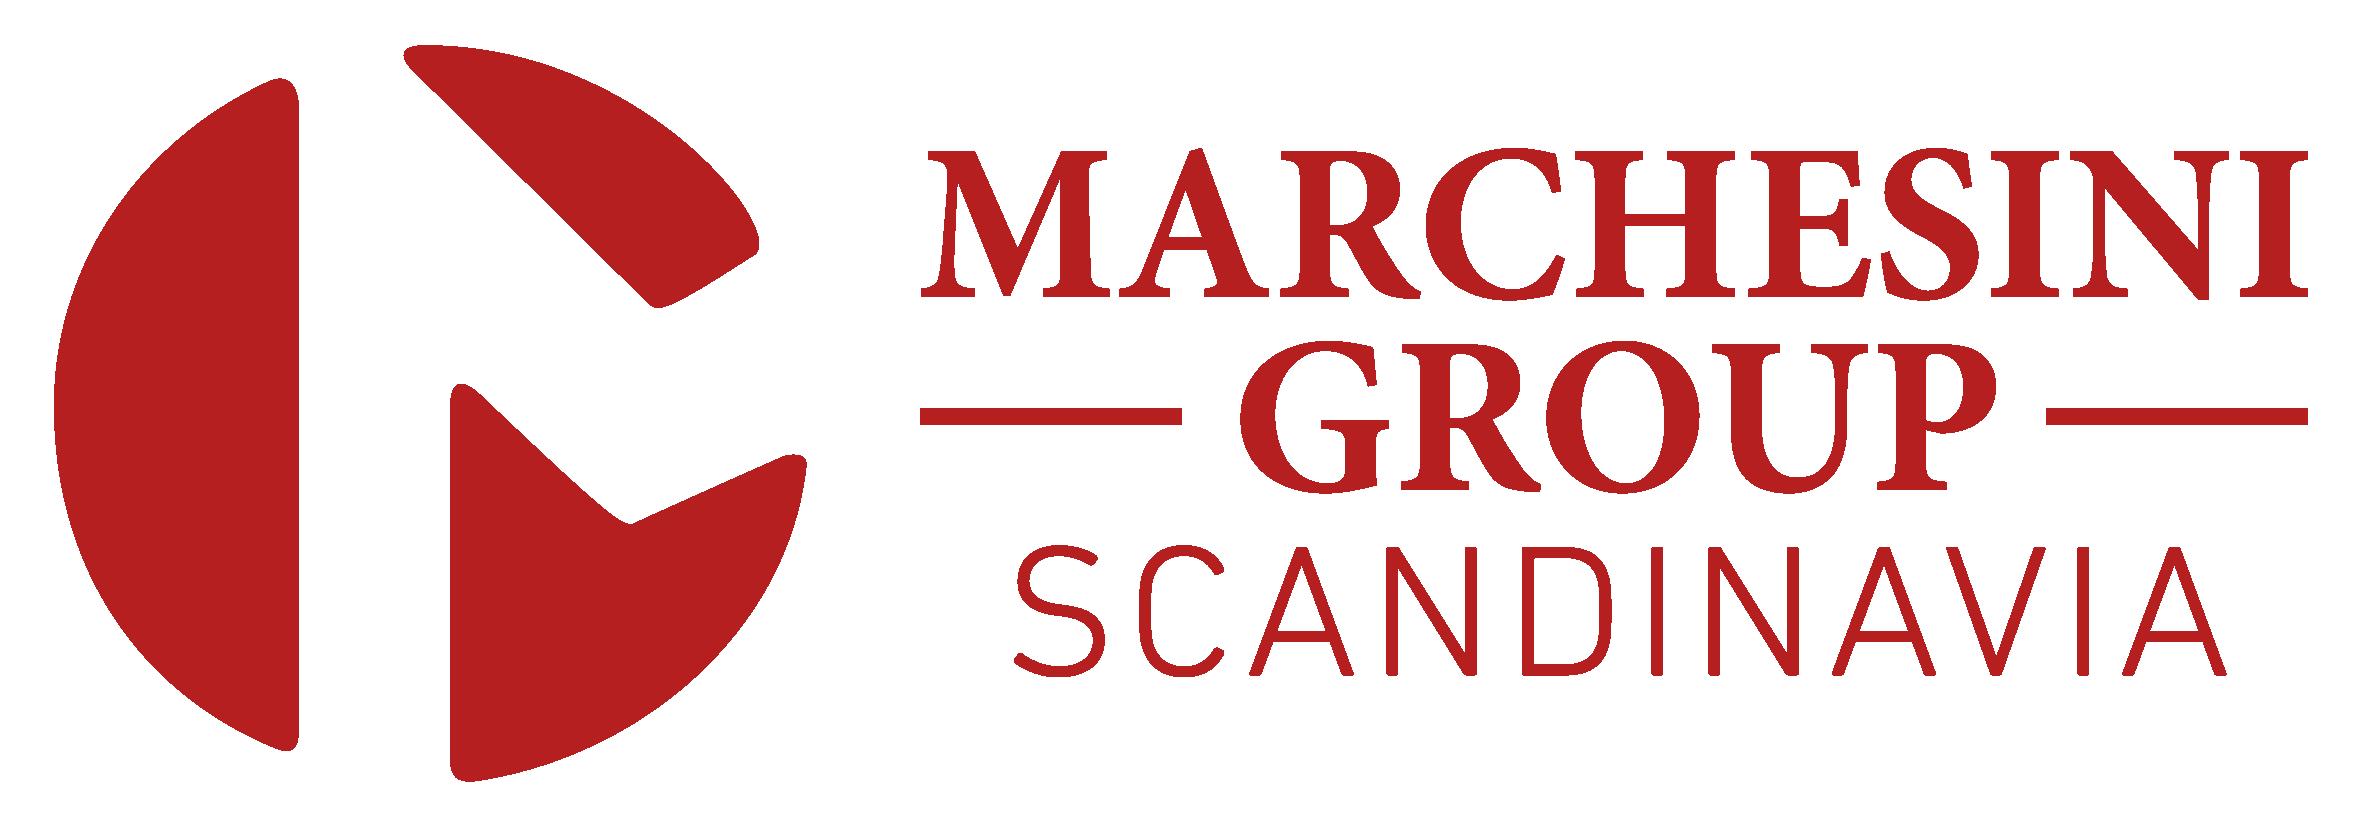 Marchesini Group Scandinavia AB